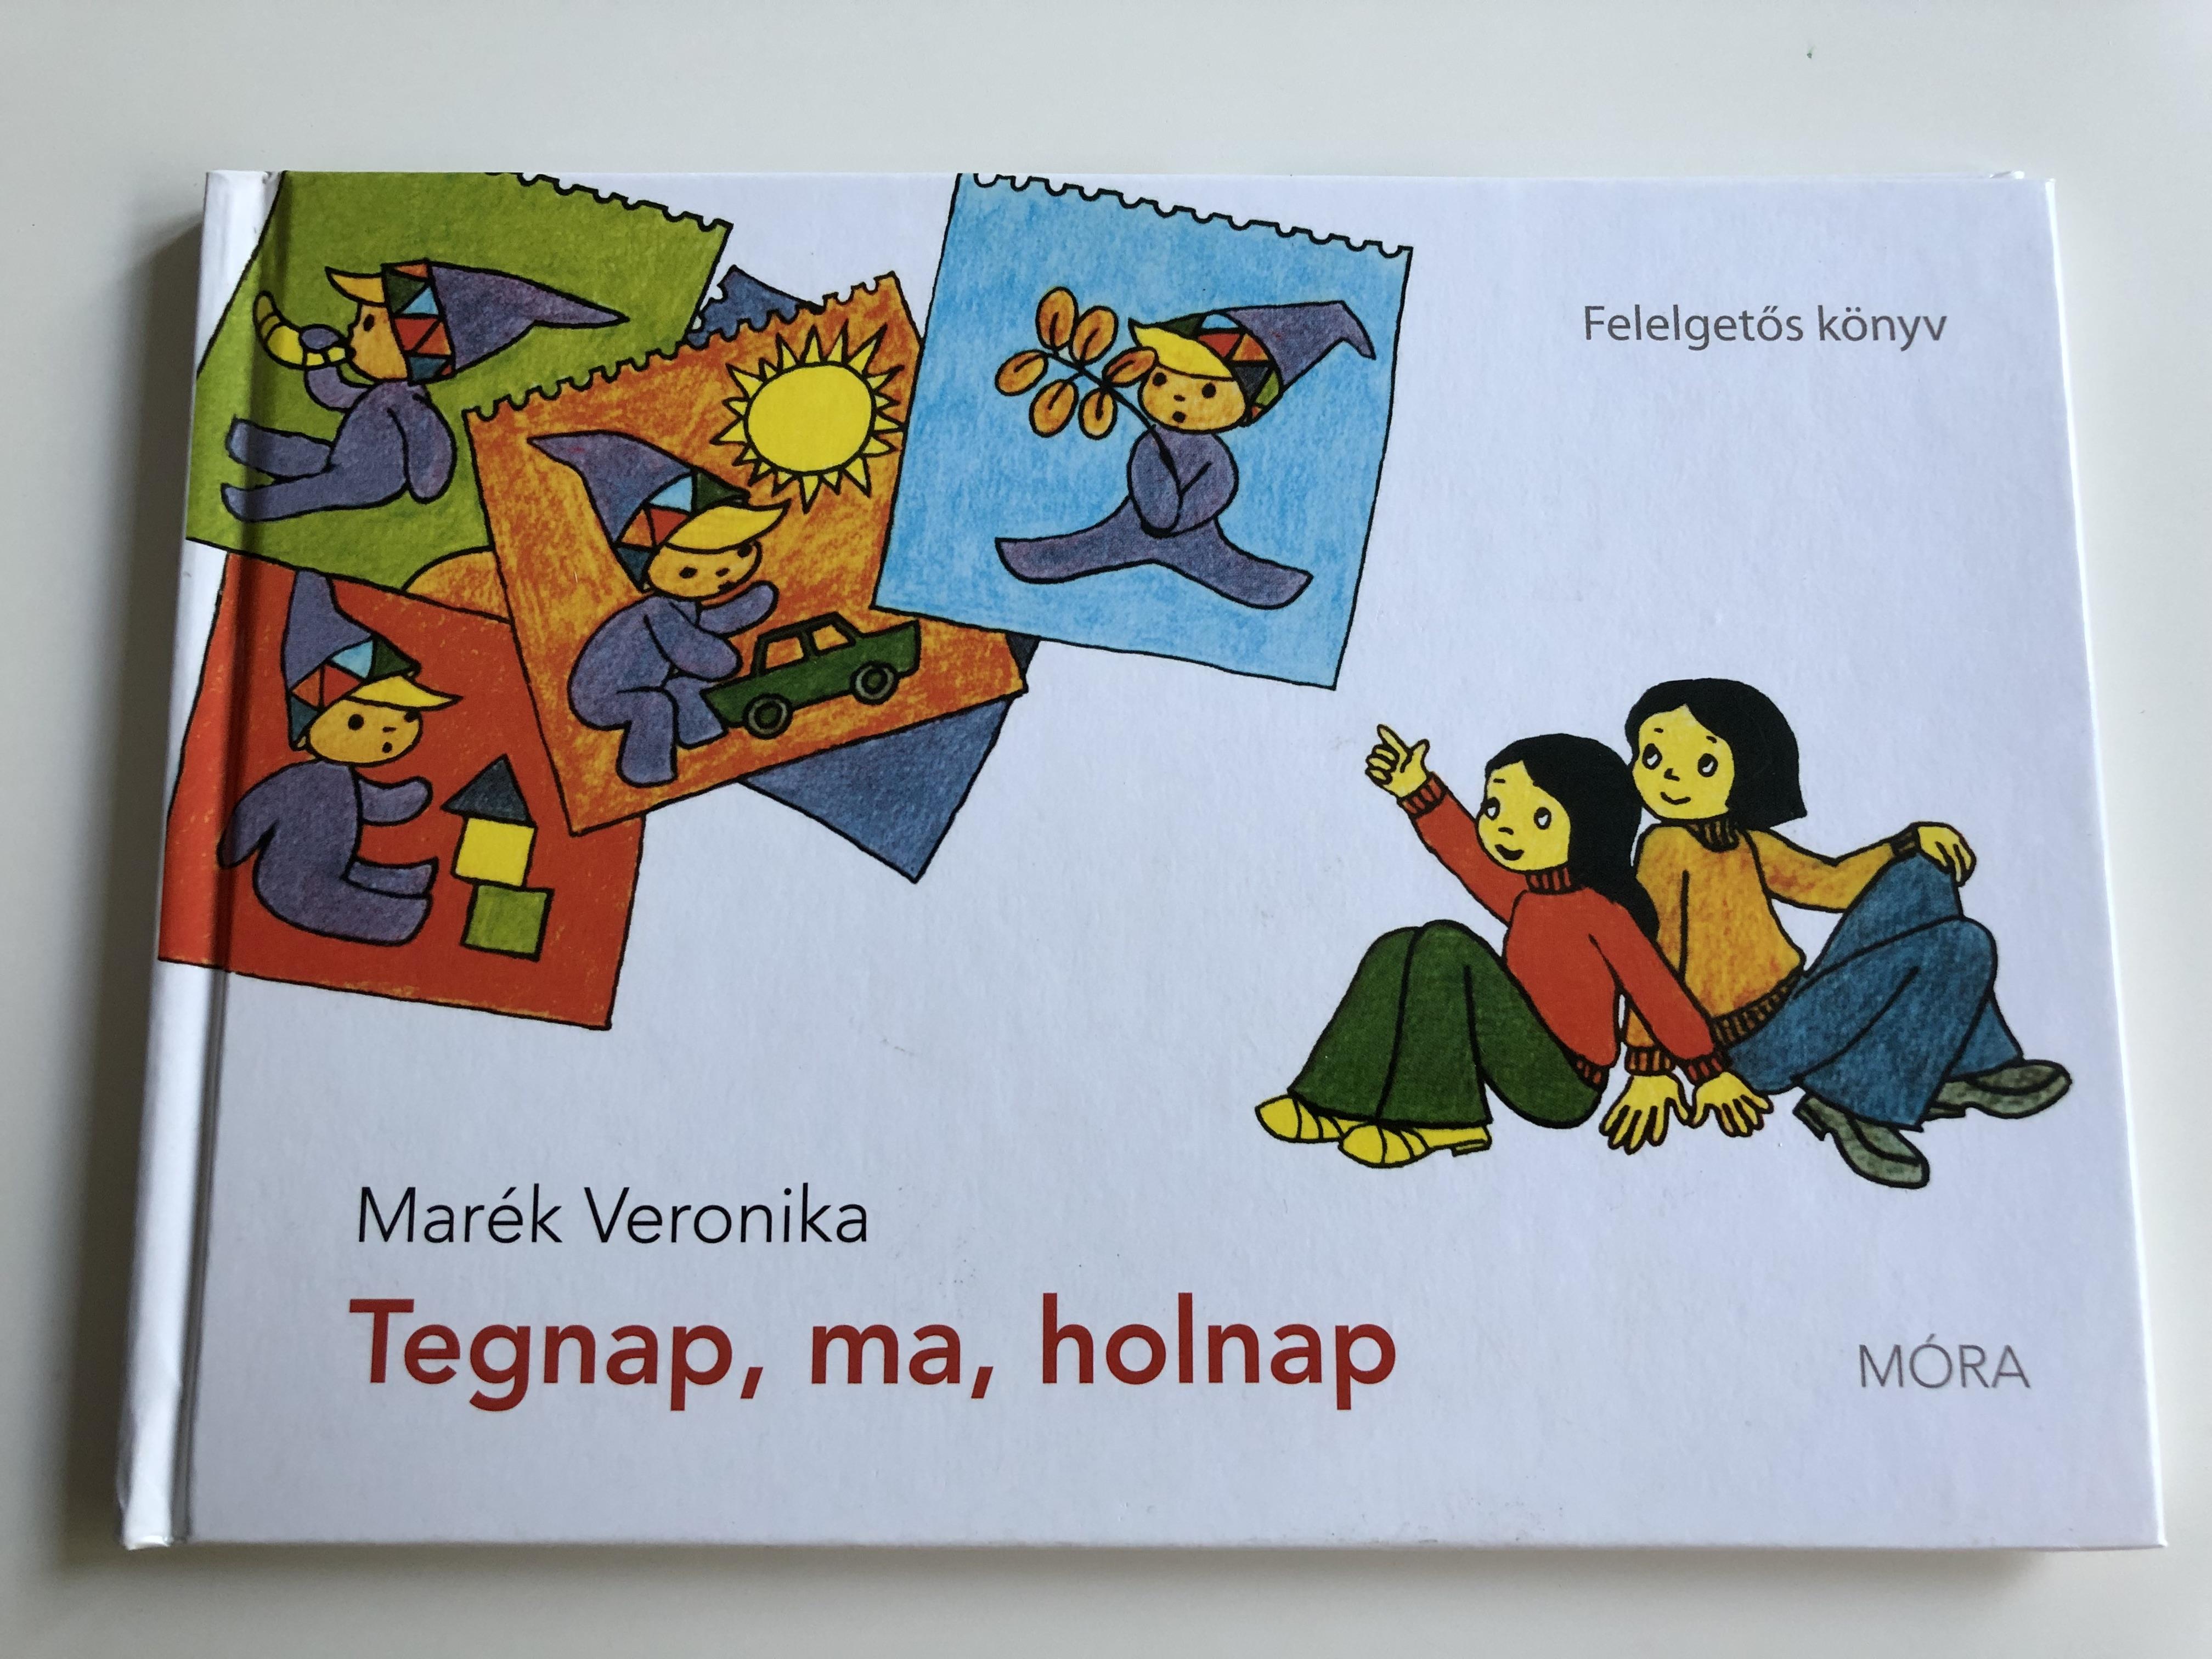 tegnap-ma-holnap-by-mar-k-veronika-felelget-s-k-nyv-hungarian-language-children-s-book-about-weekdays-m-ra-k-nyvkiad-2011-1-.jpg